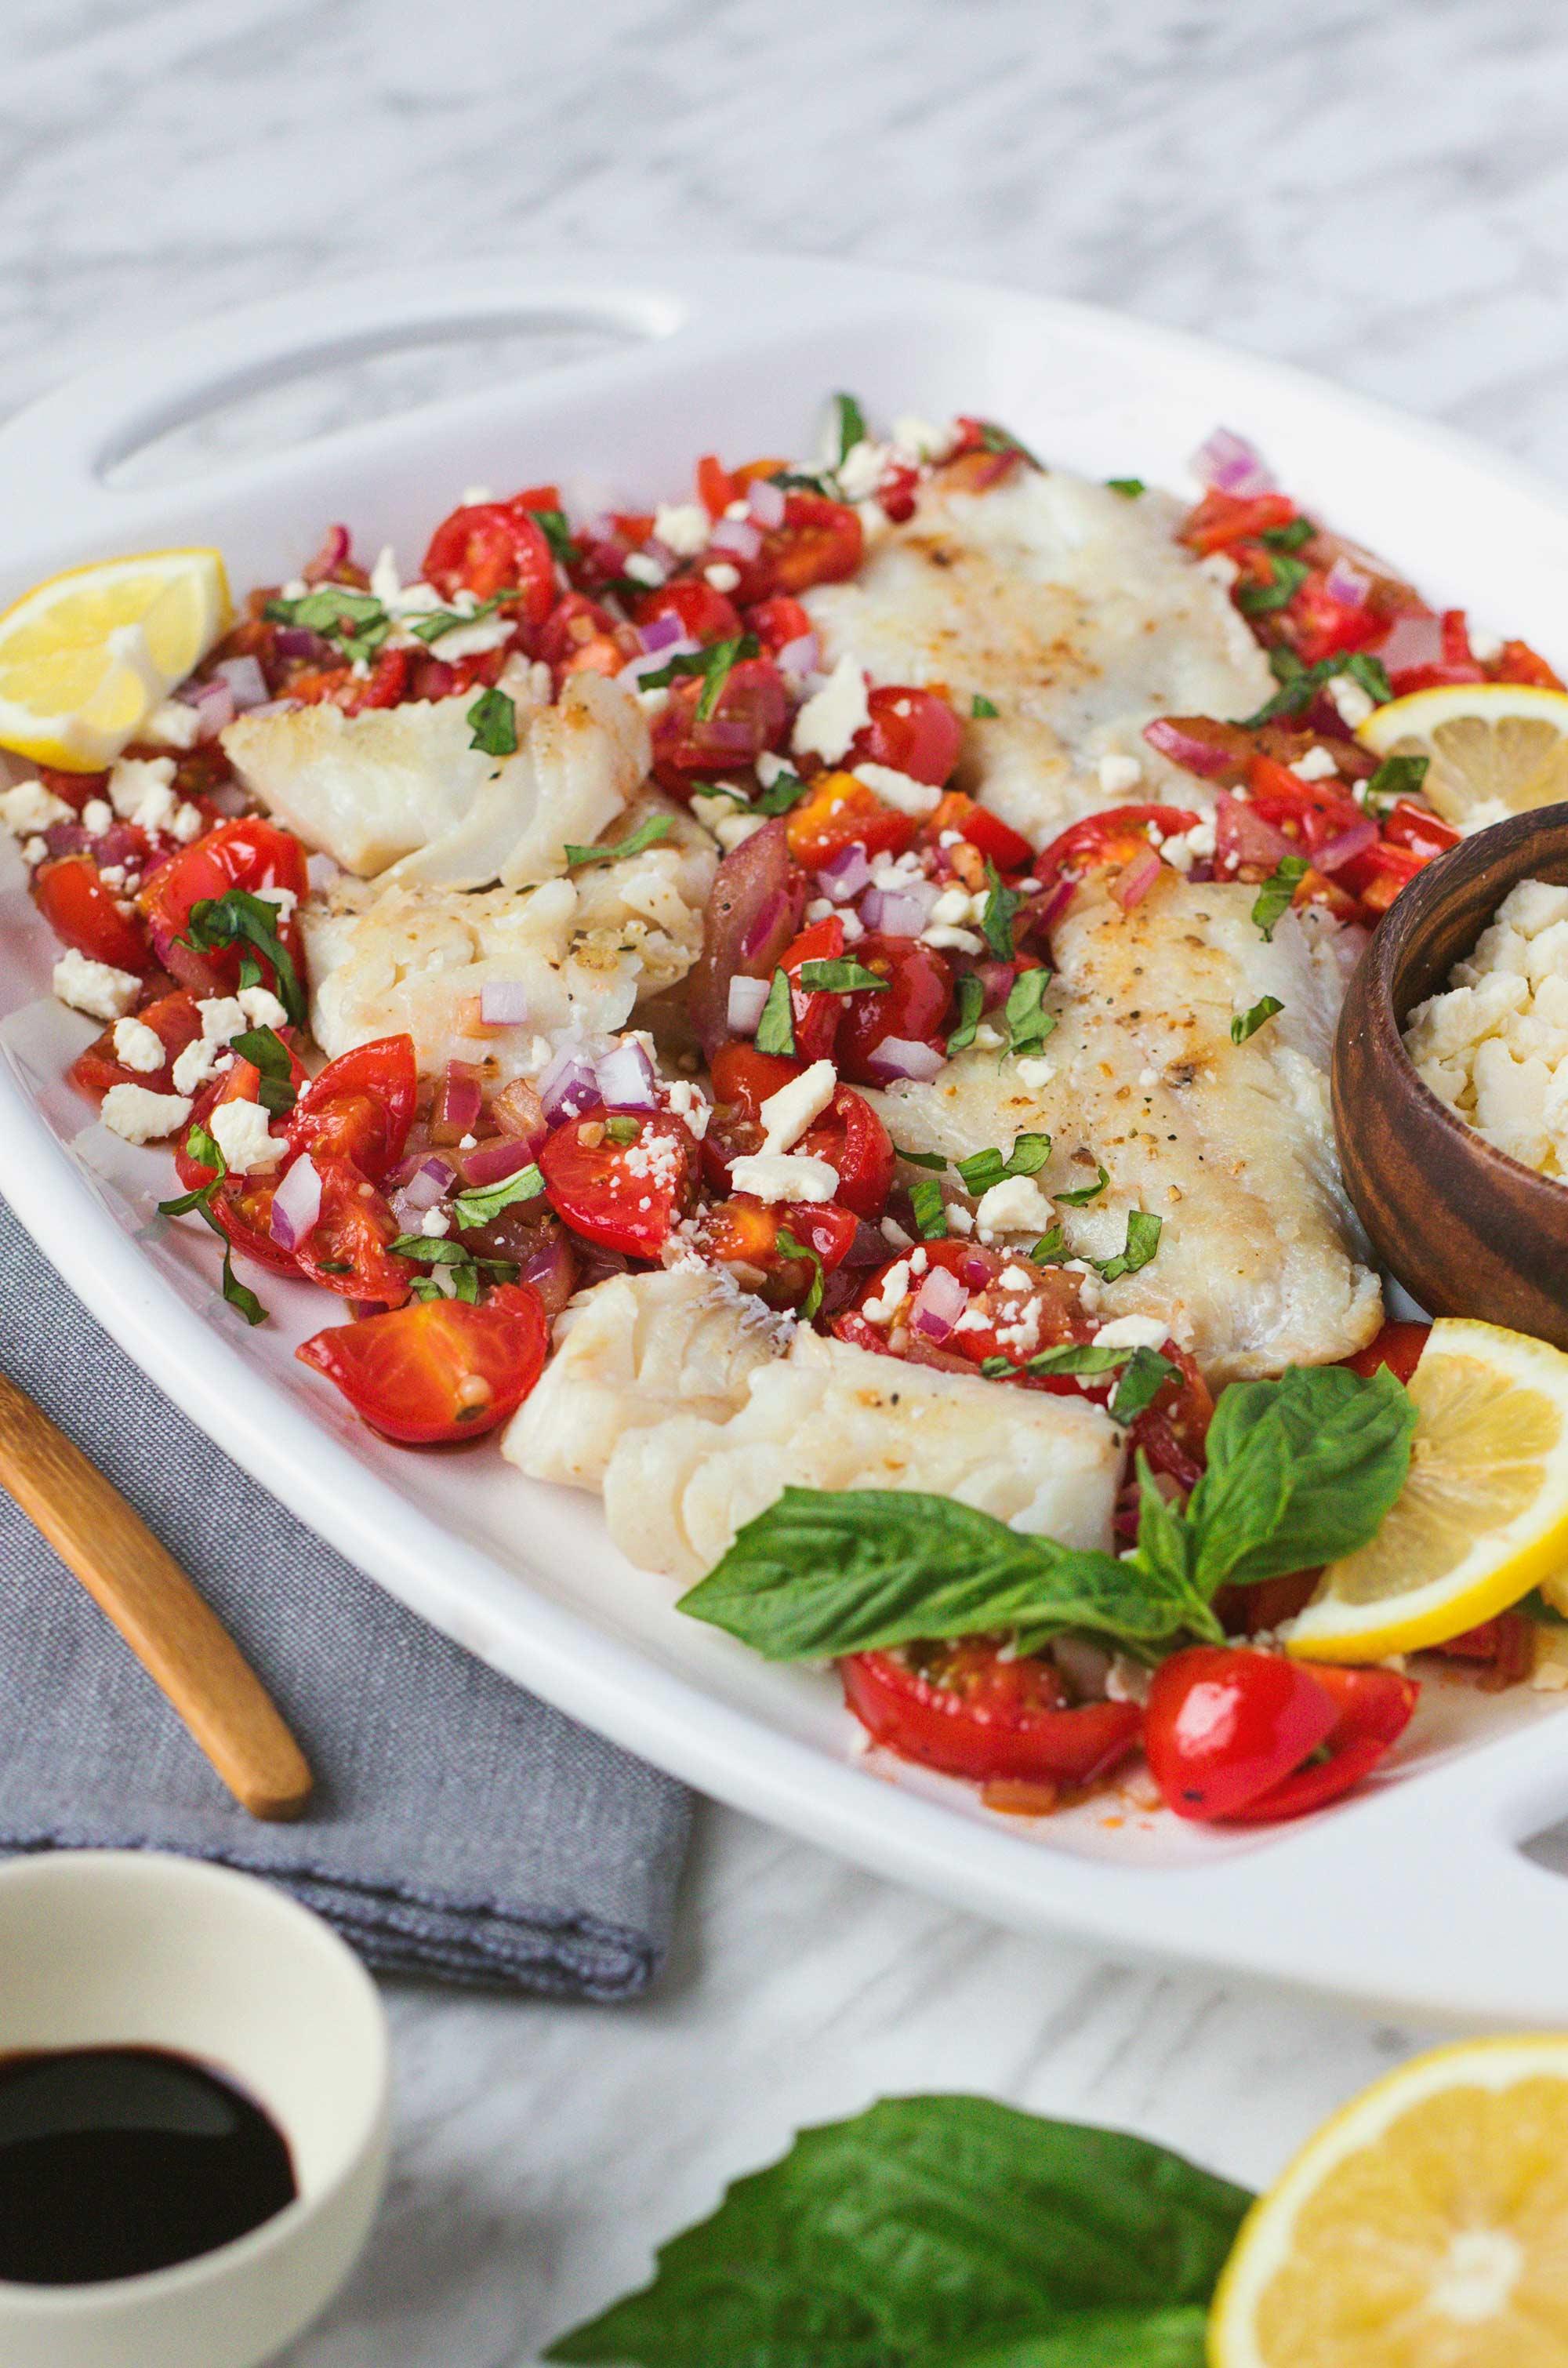 15 Minute Mediterranean Fish Dish by Greta